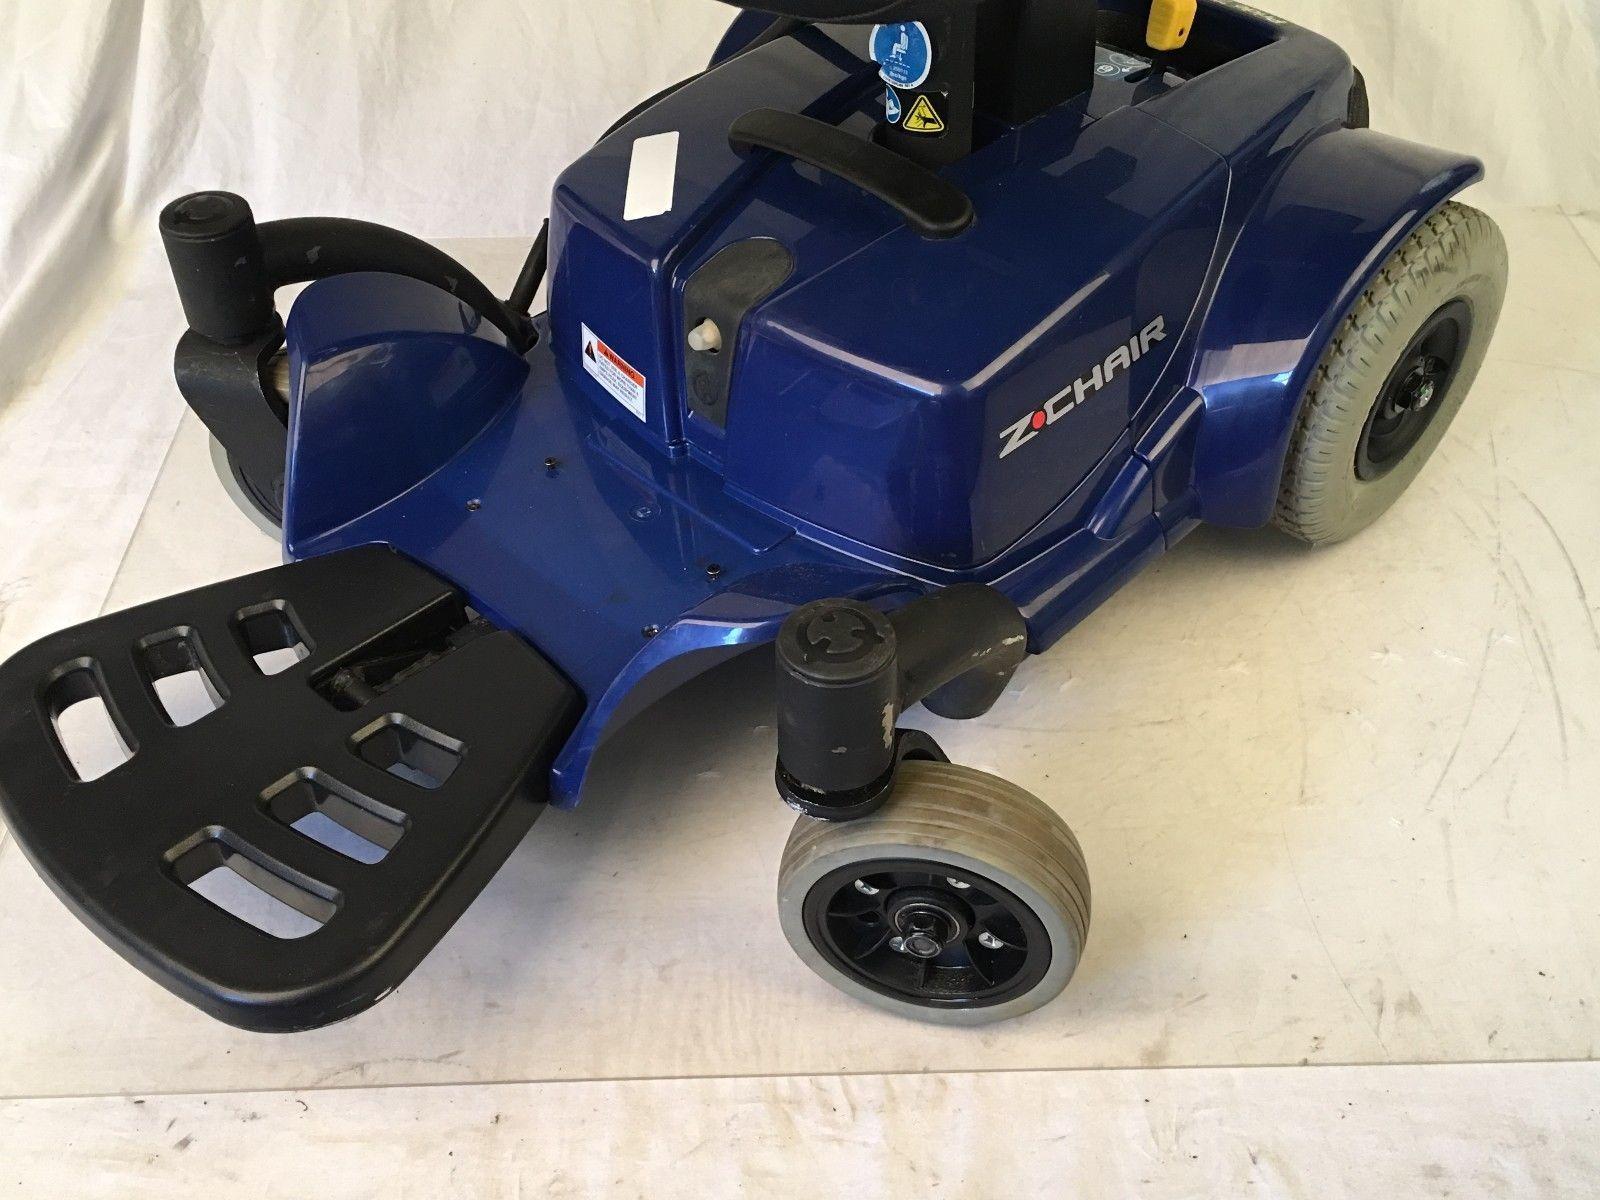 Pride ZChair Power Wheelchairs w/ Pg Drives 4 Key Joystick